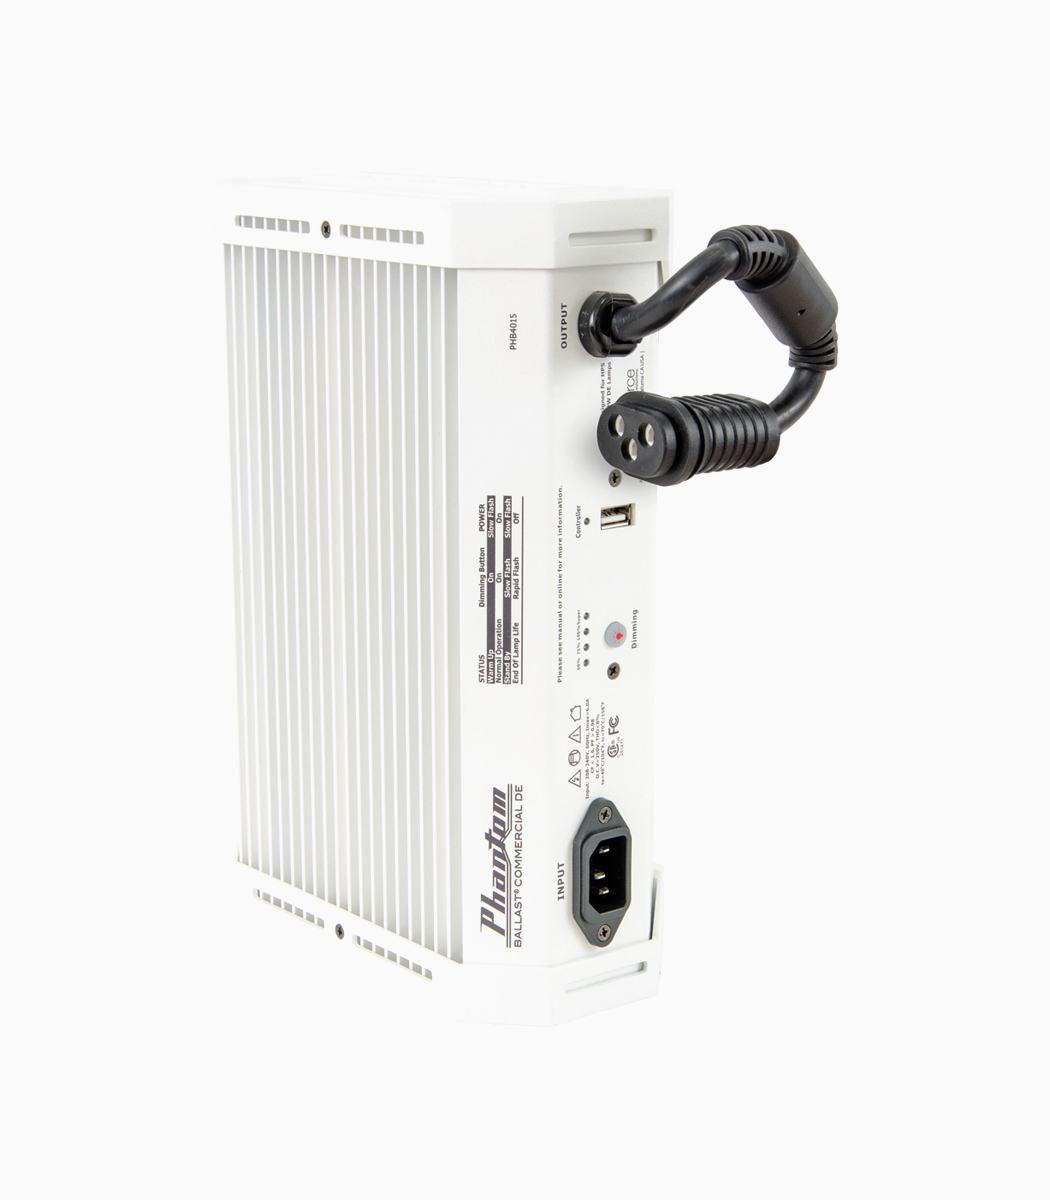 Phantom Commercial 1000W Dimmible Double-Ended Digital Ballast W/USB Interface HPS 208-240V